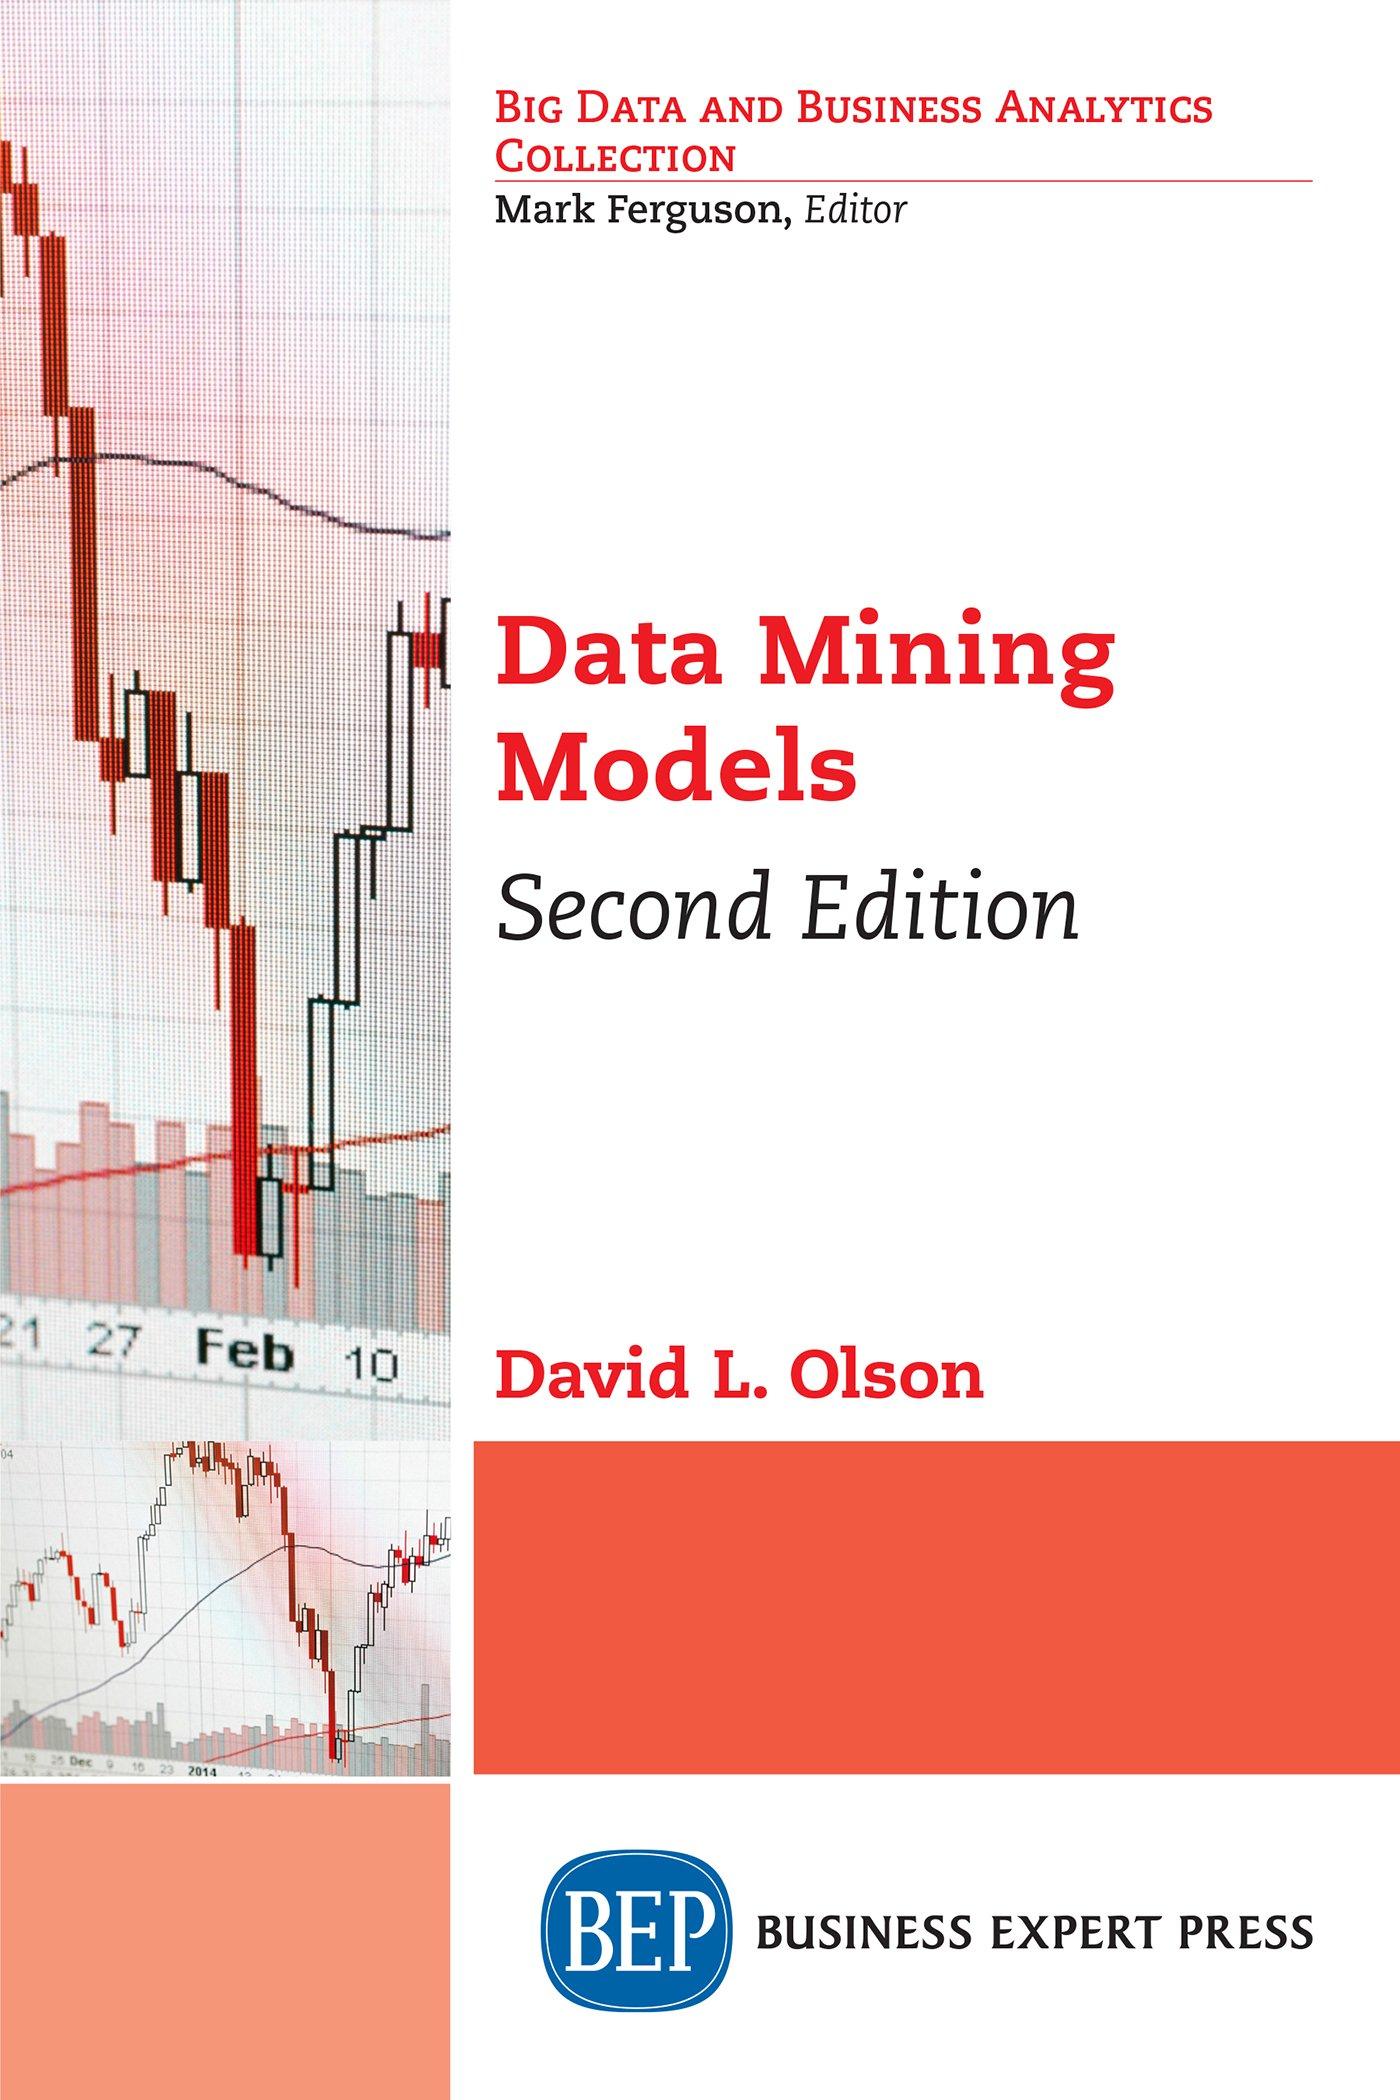 Data Mining Models, Second Edition